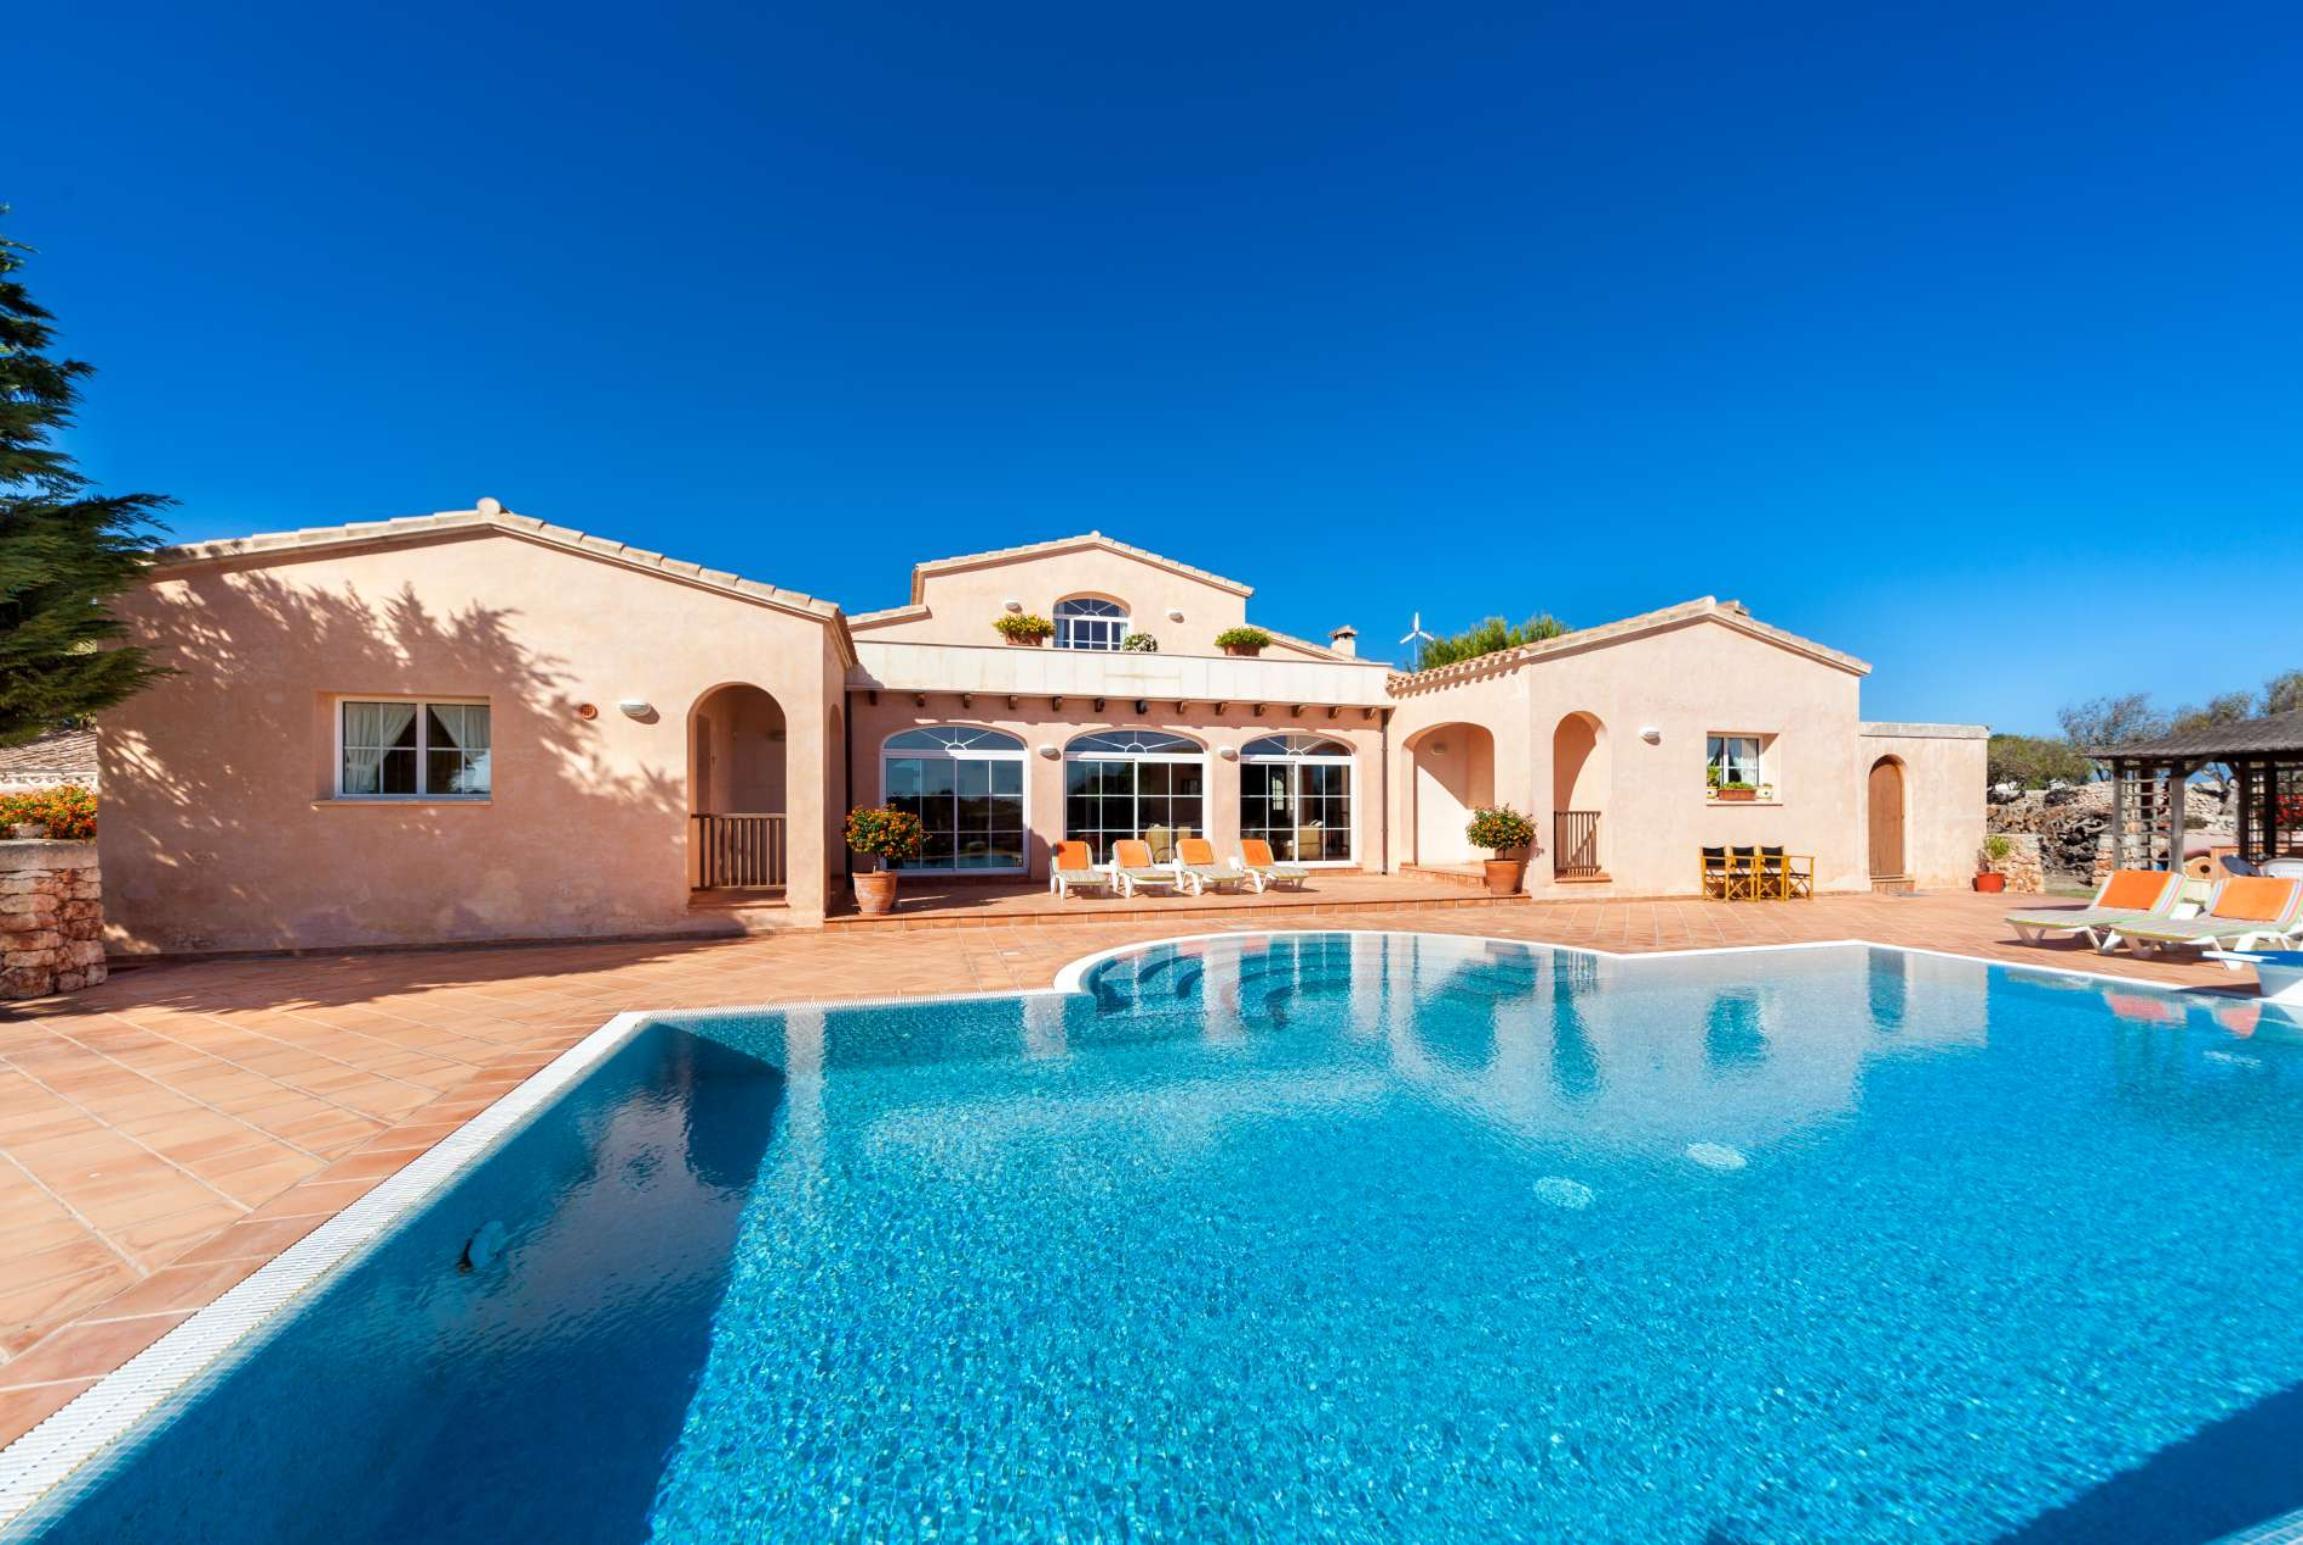 Ferienhaus Villa Estrellita (2649653), Punta Prima, Menorca, Balearische Inseln, Spanien, Bild 24